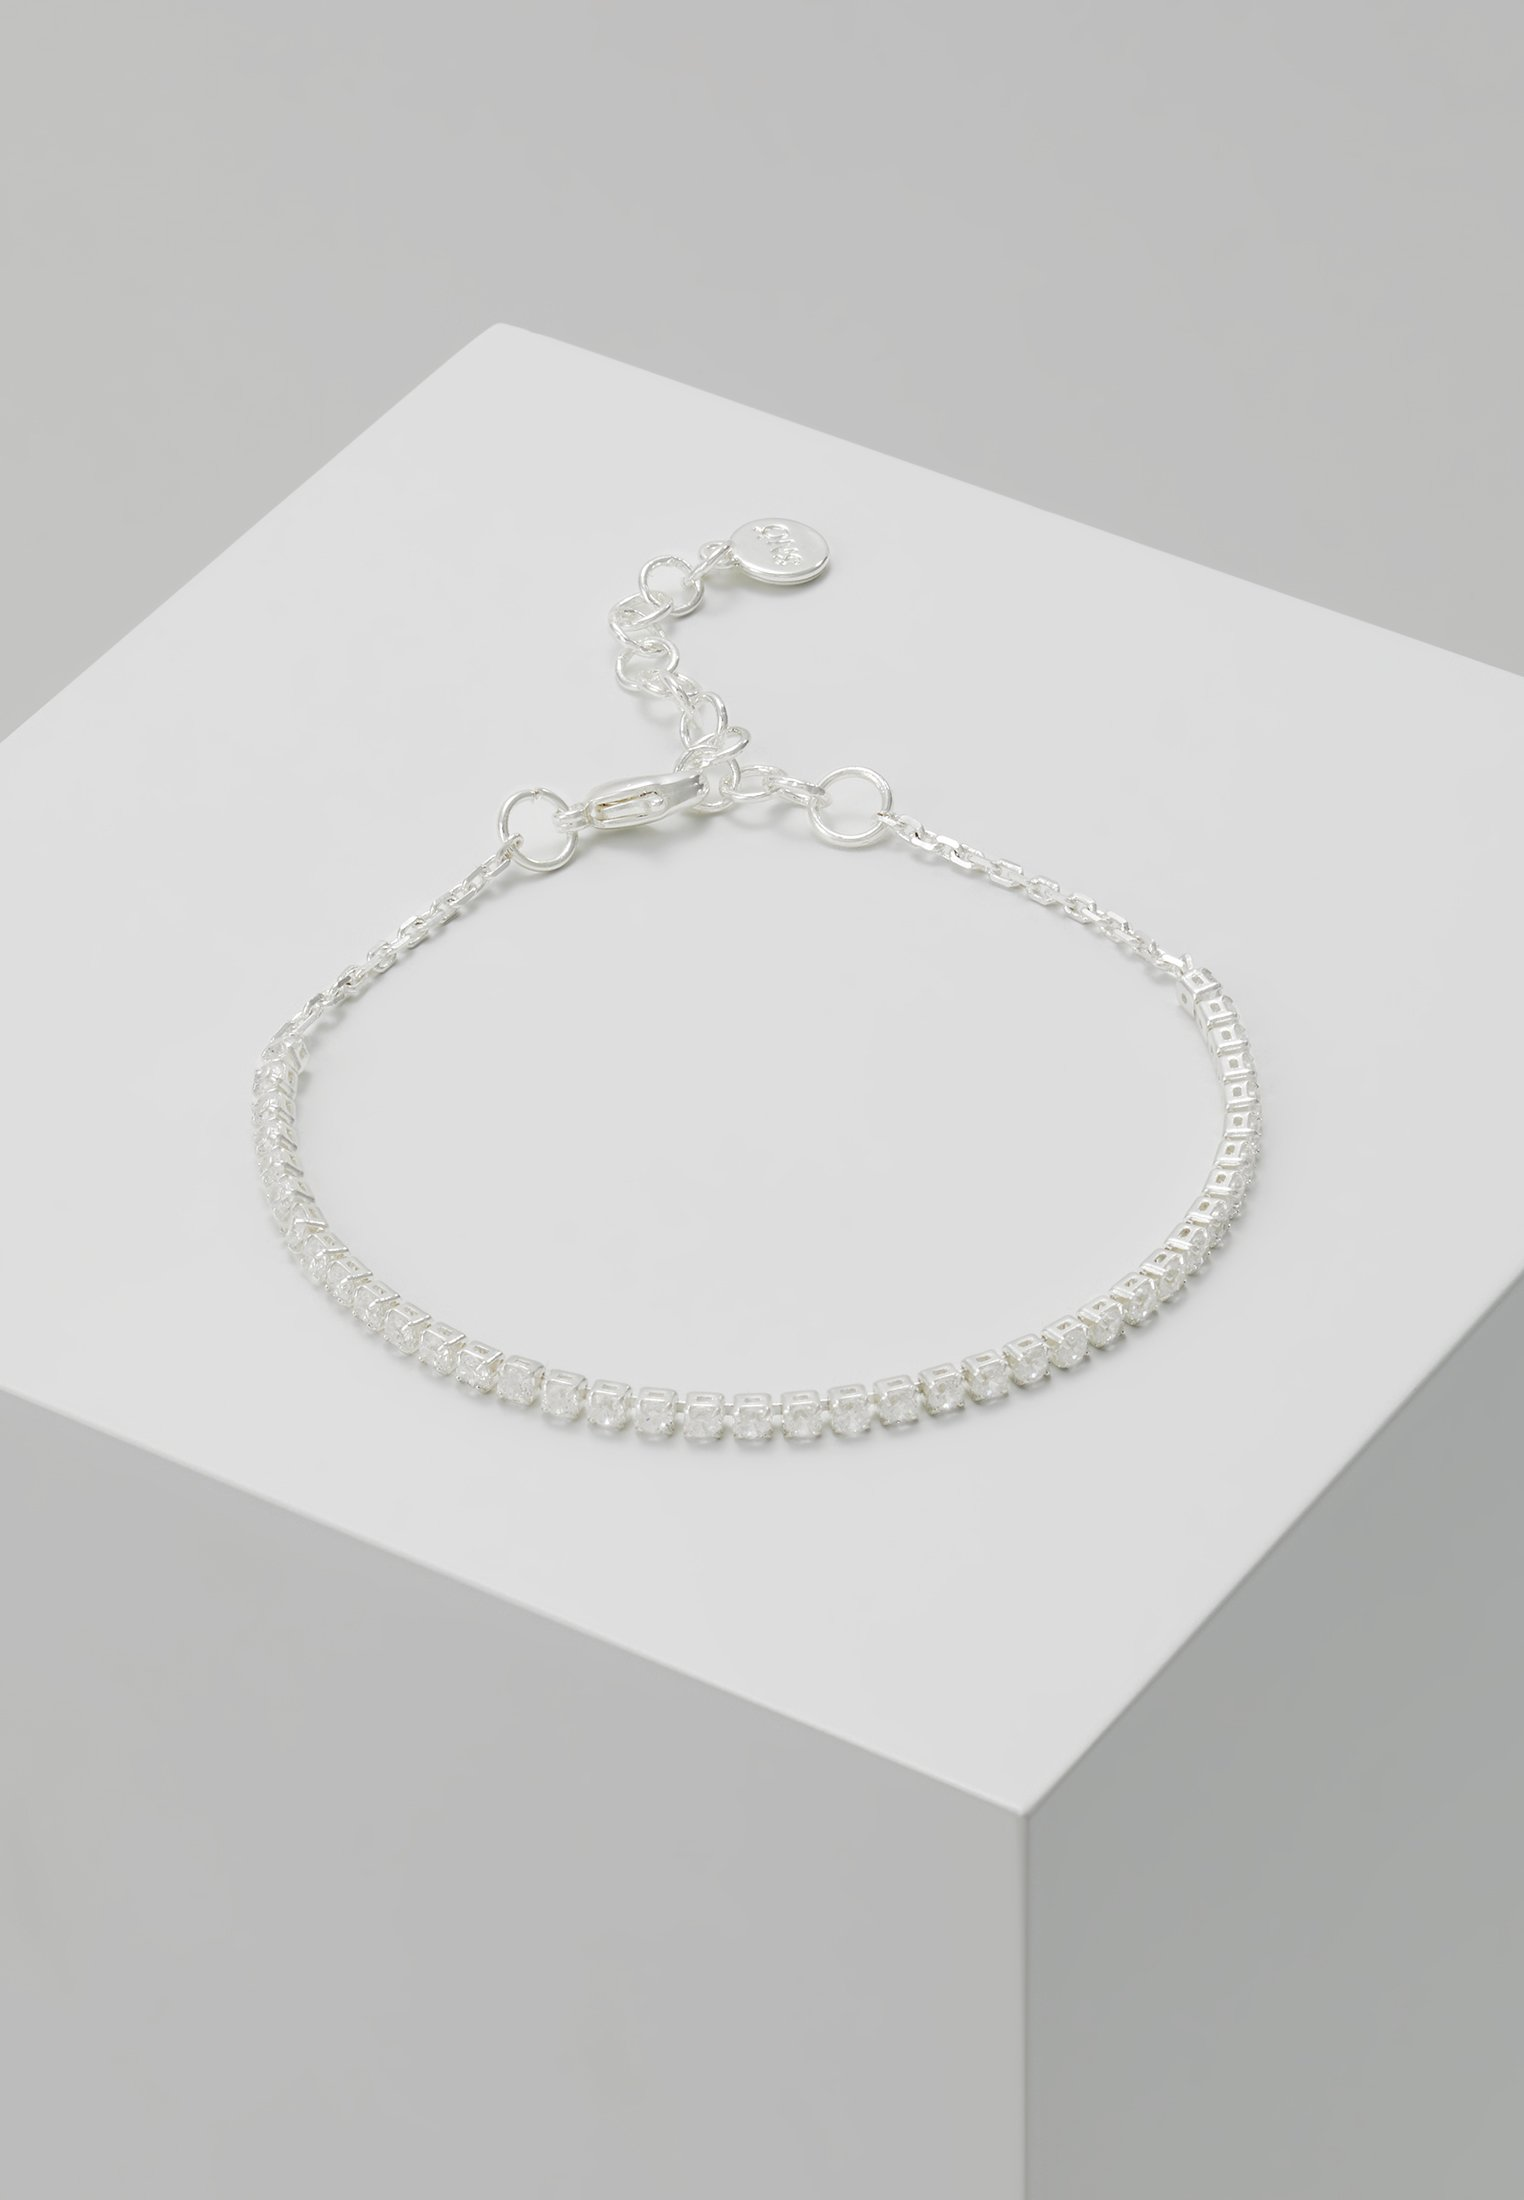 Femme CLARISSA SMALL BRACE - Bracelet